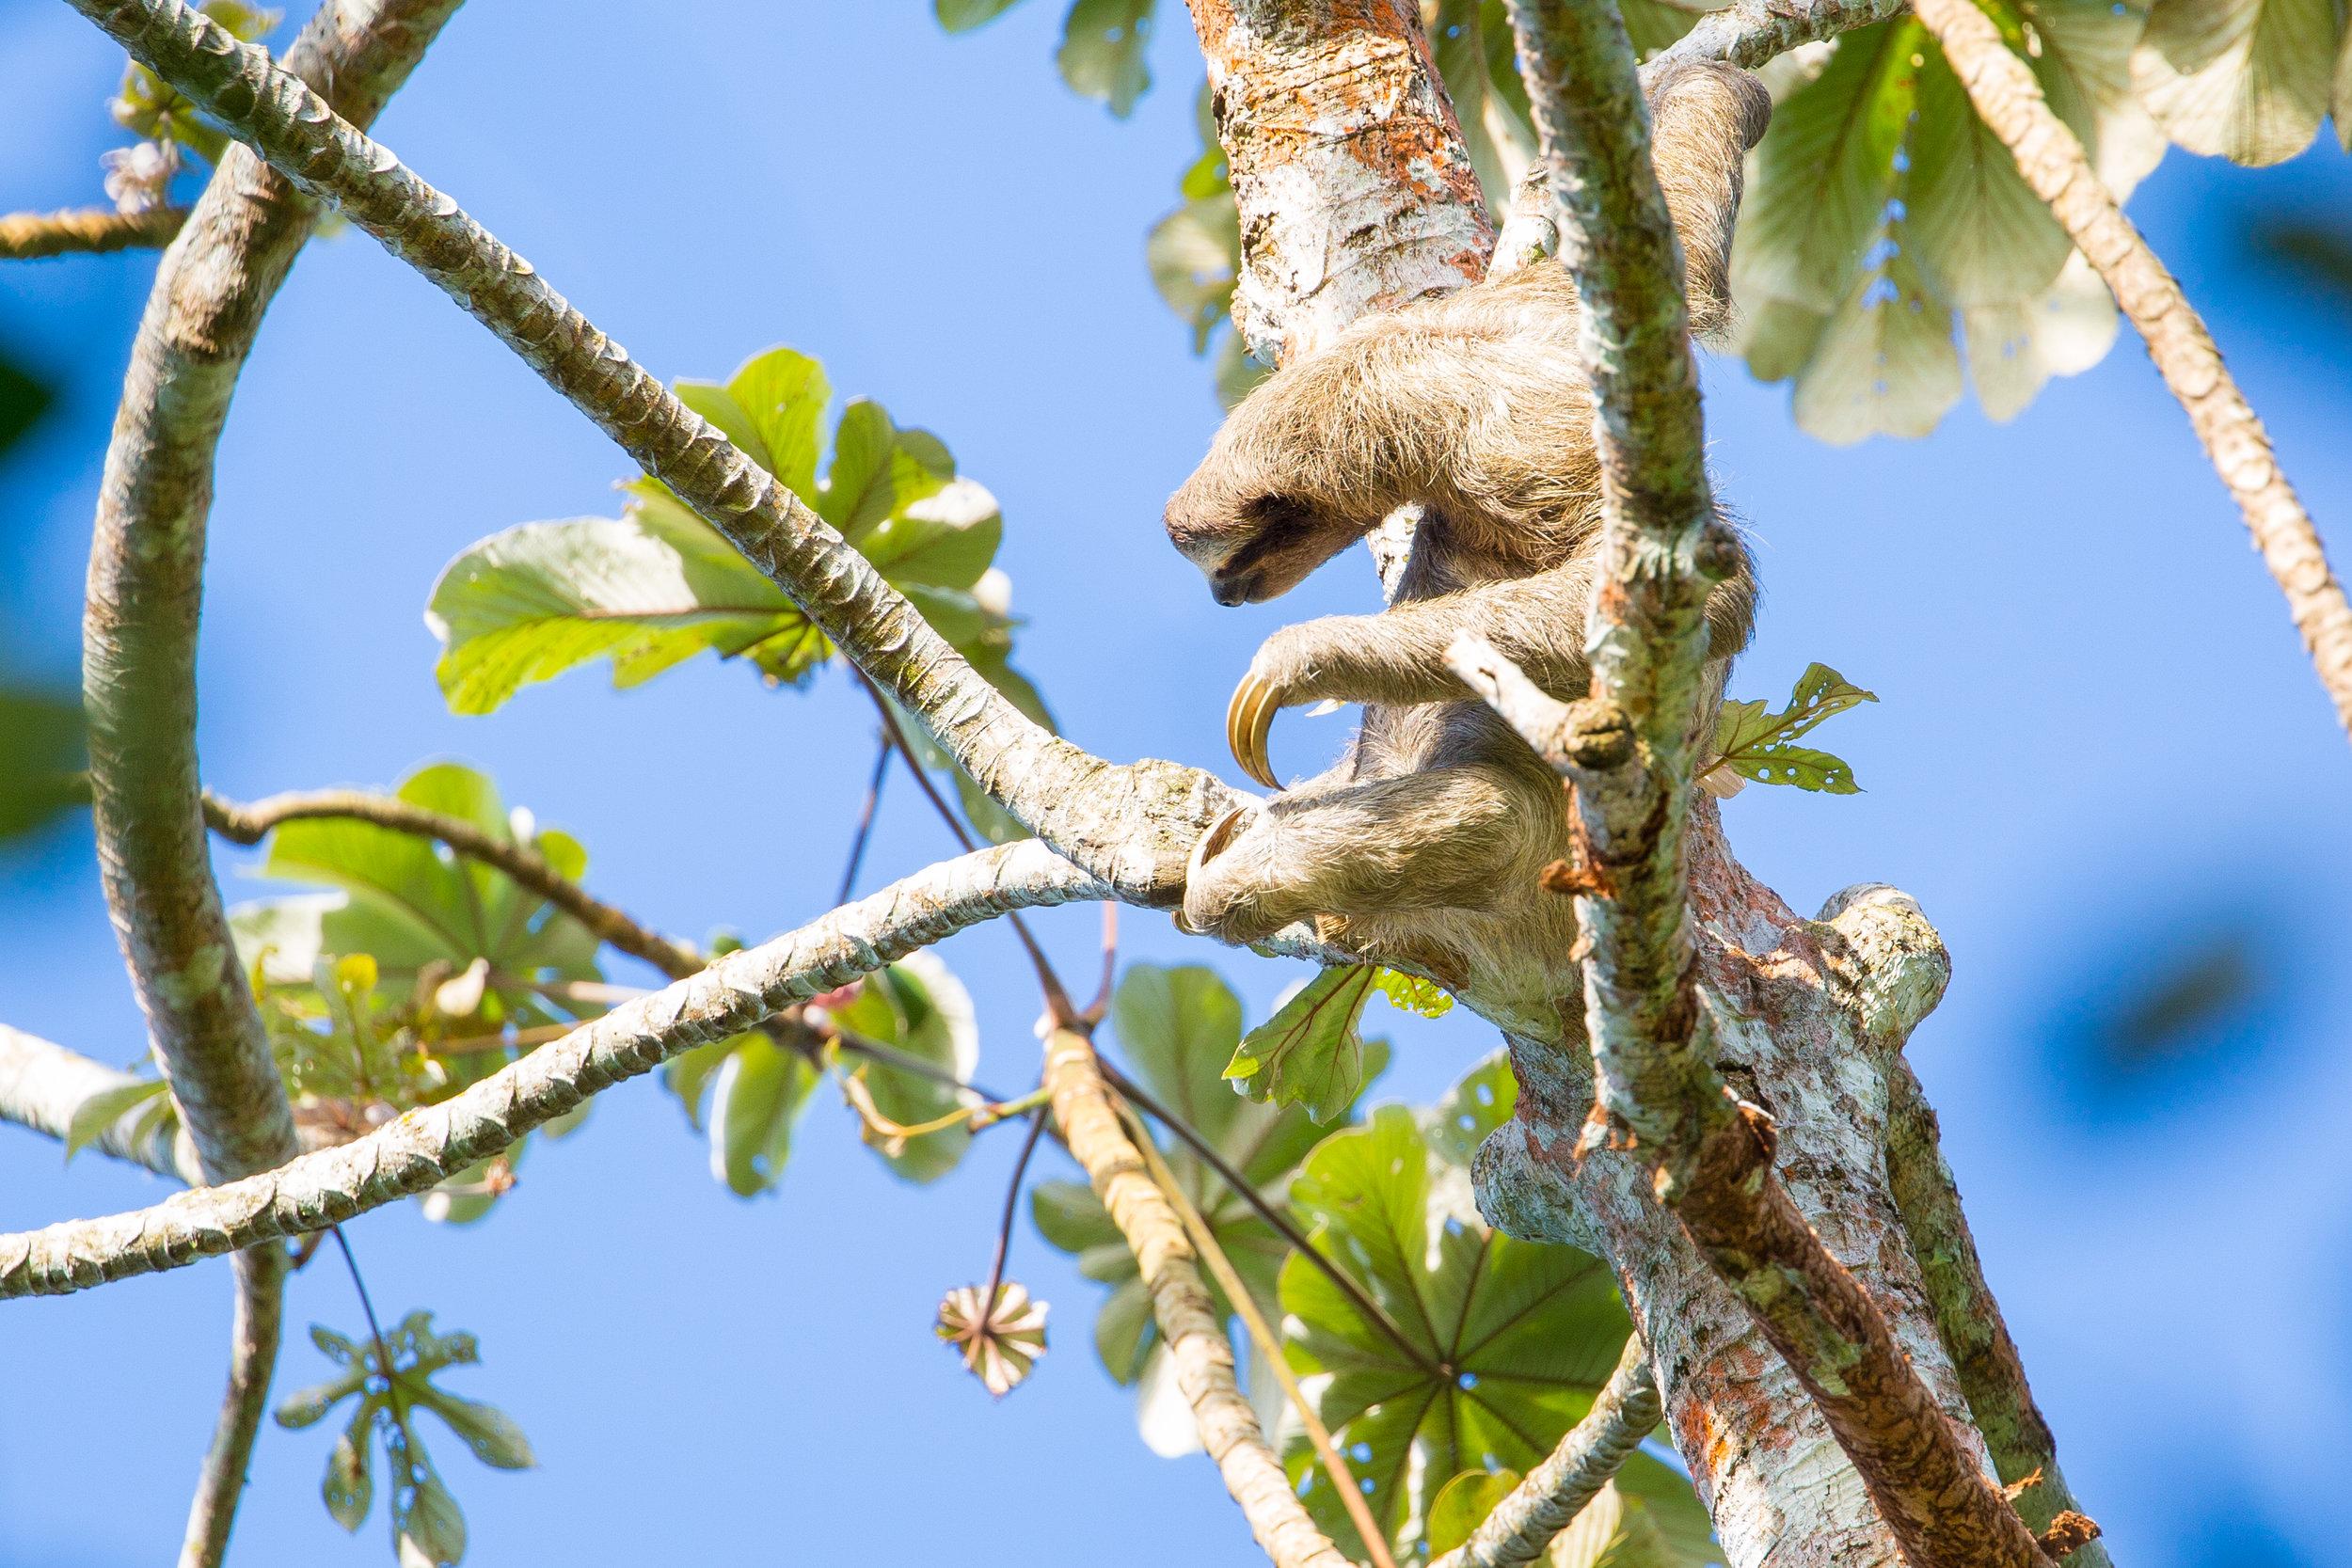 Brown-throated sloth   ( Bradypus variegatus )